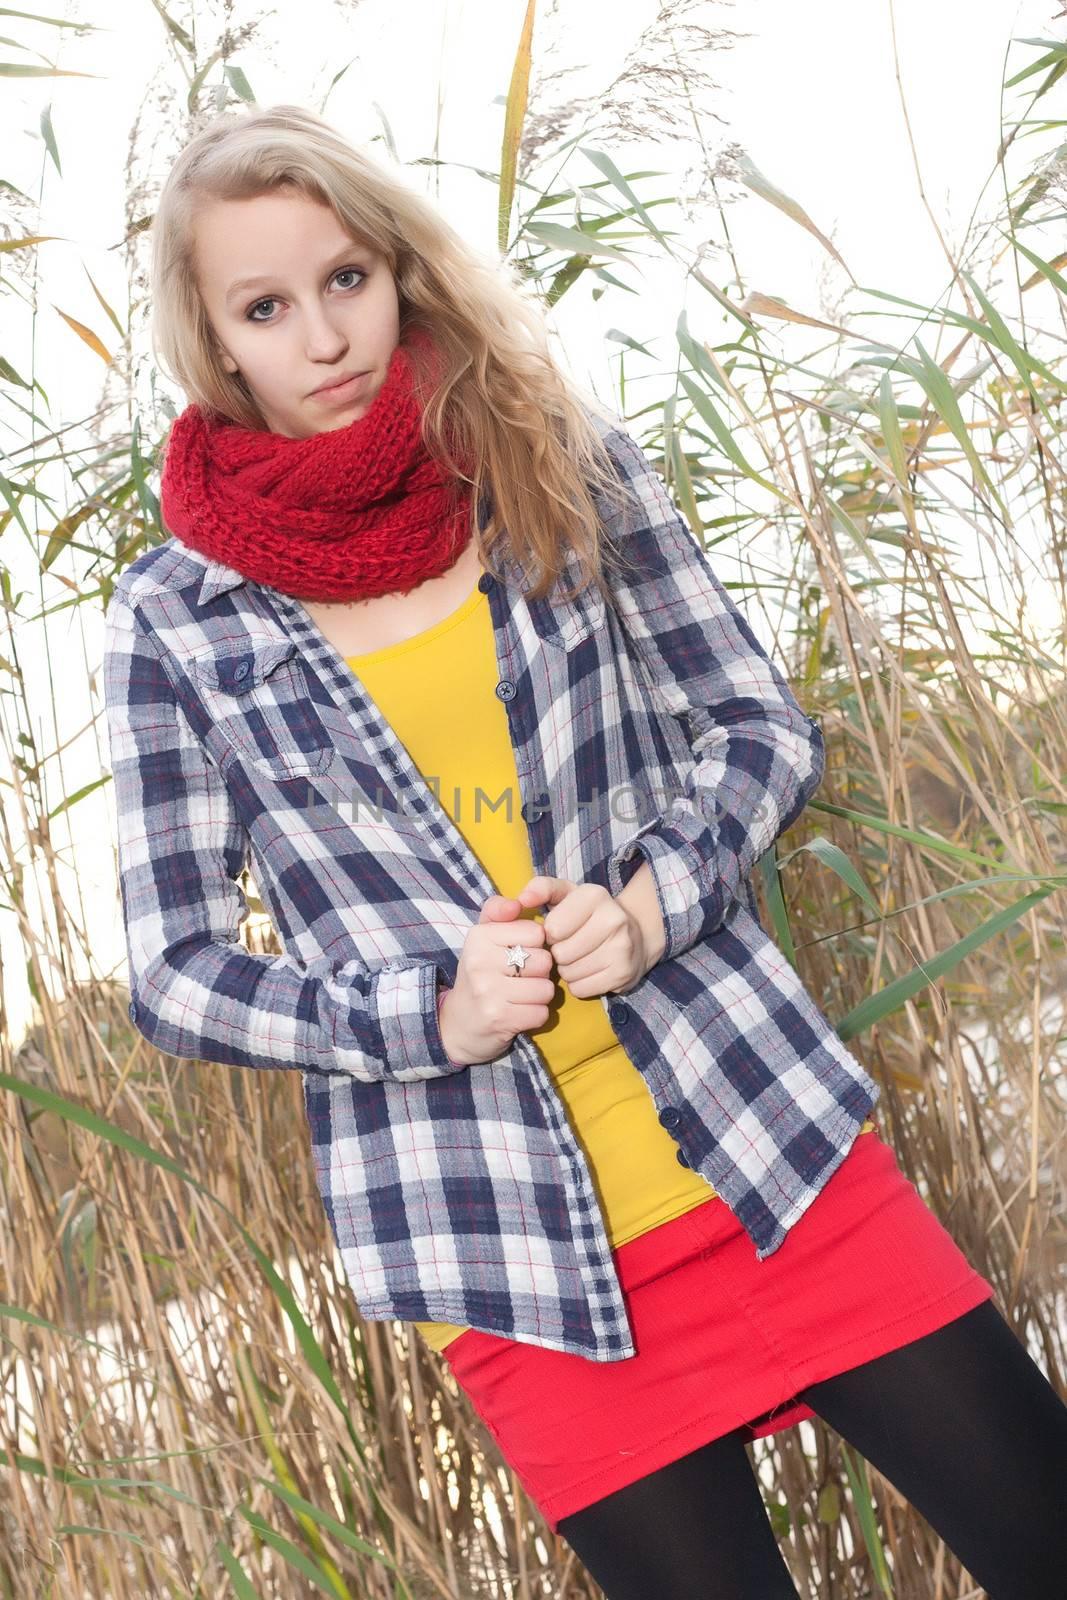 Blong teenage fashion girl in the autumn